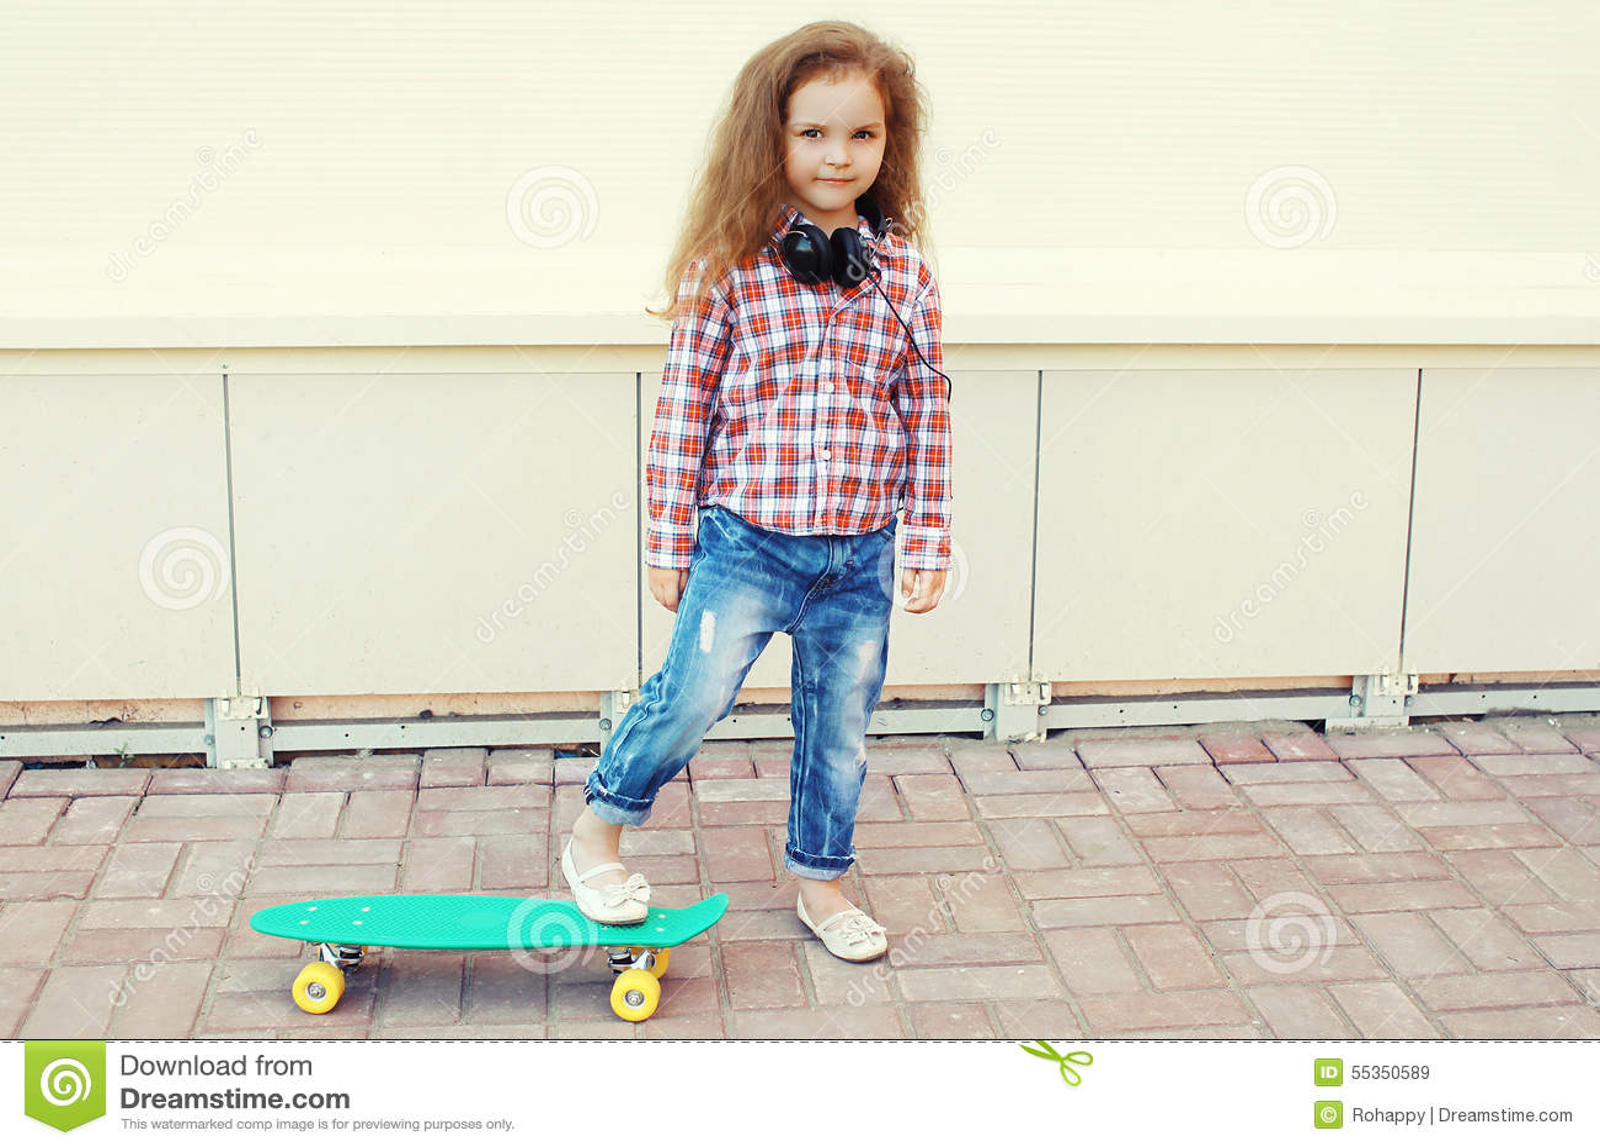 Fashion kid. Stylish little girl child with skateboard